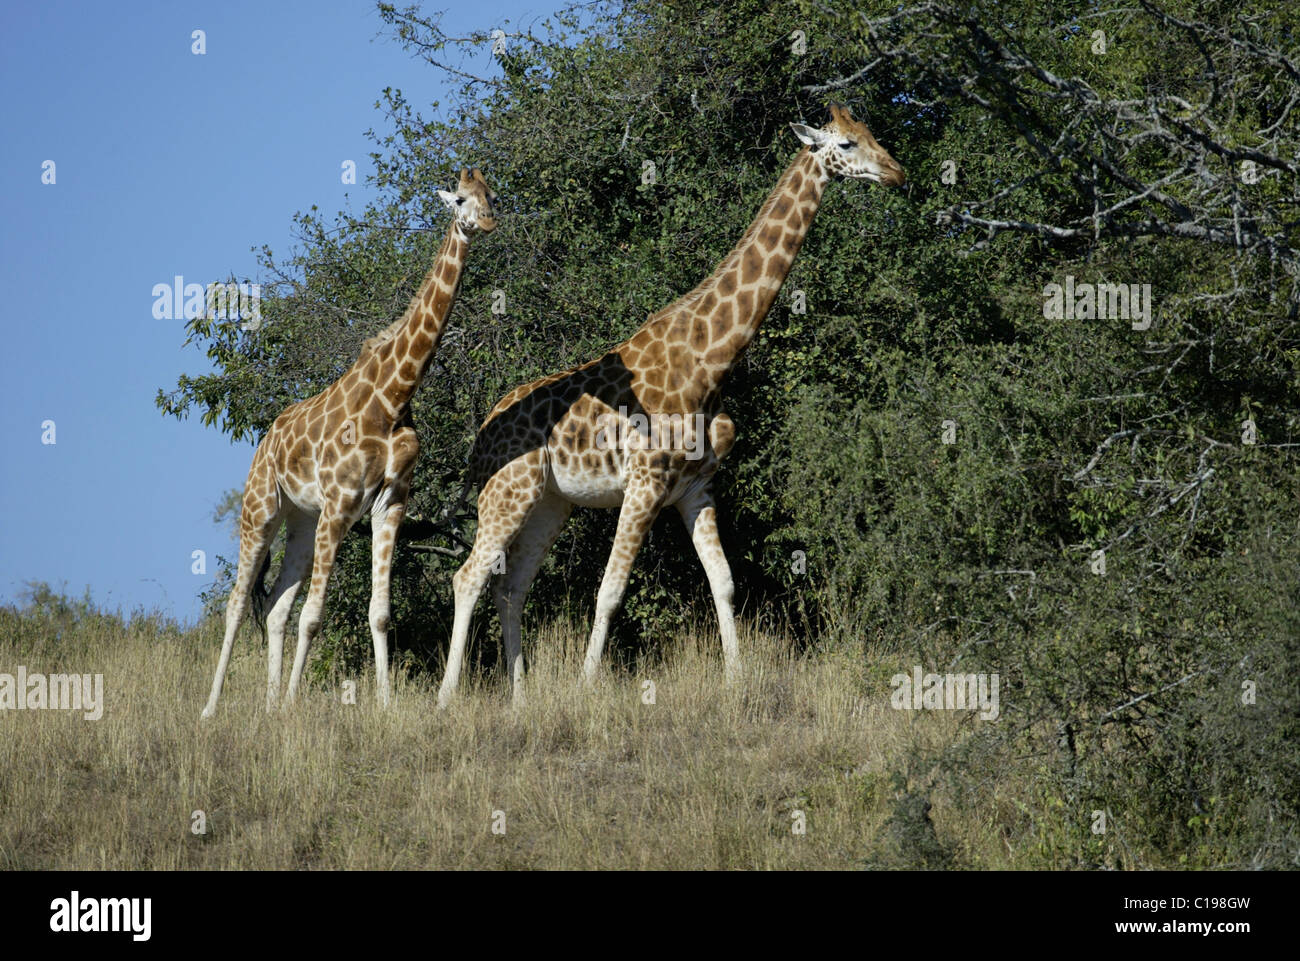 Les Girafes de Rothschild, Baringo girafes de l'Ouganda les girafes (Giraffa camelopardalis rothschildi), adulte, le lac Nakuru, Kenya, Africa Banque D'Images